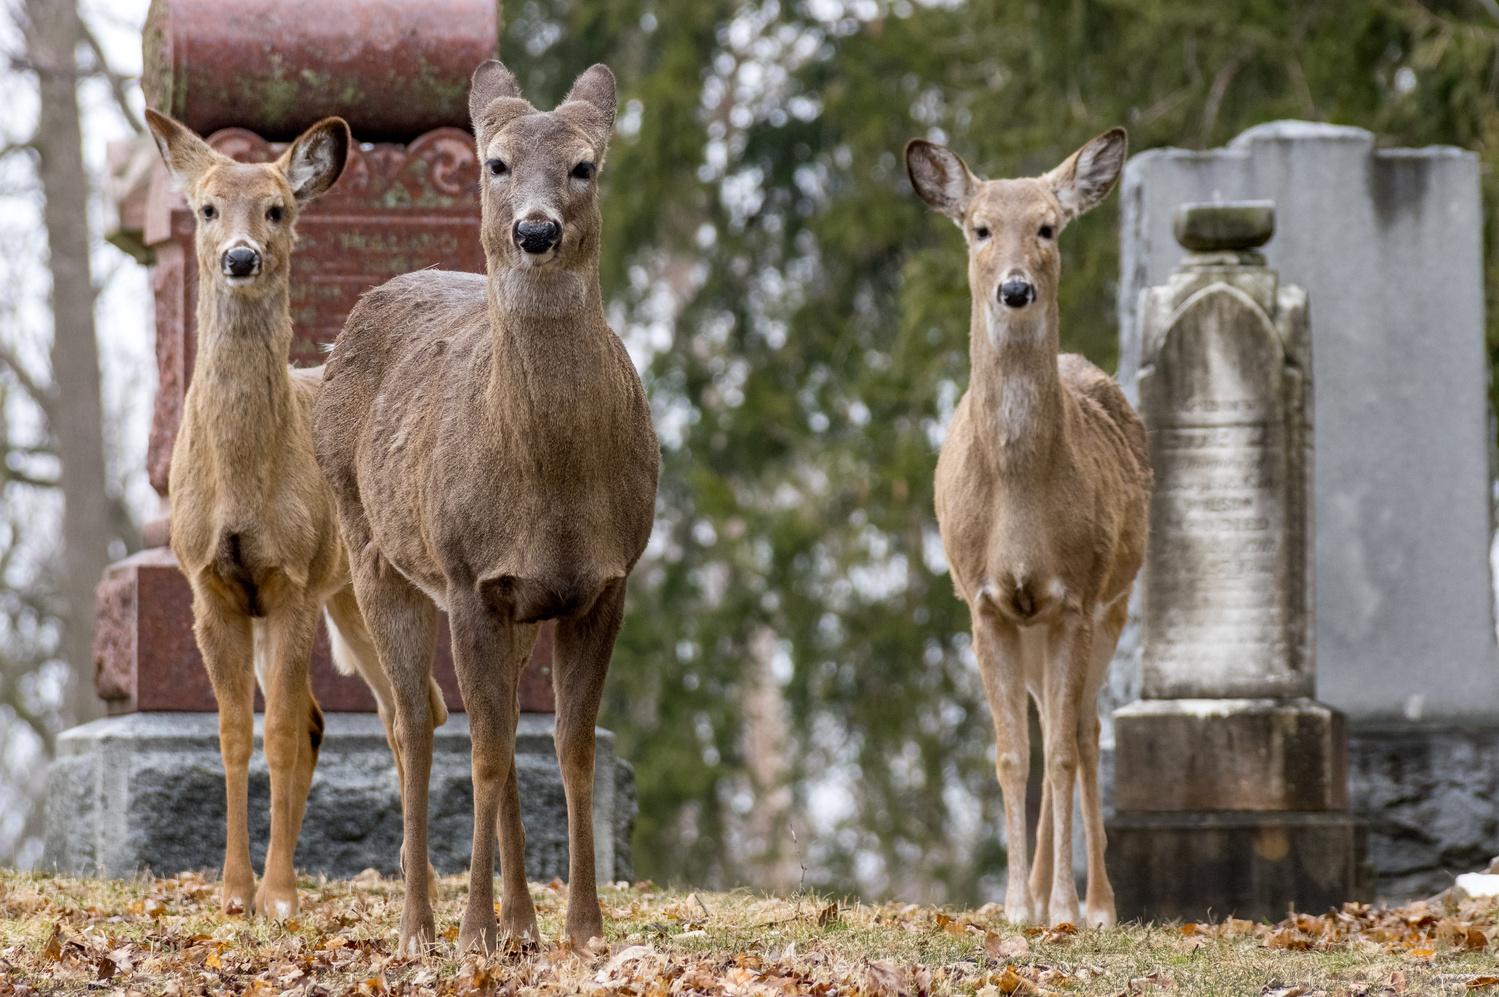 Deer in a graveyard by Jason Orr